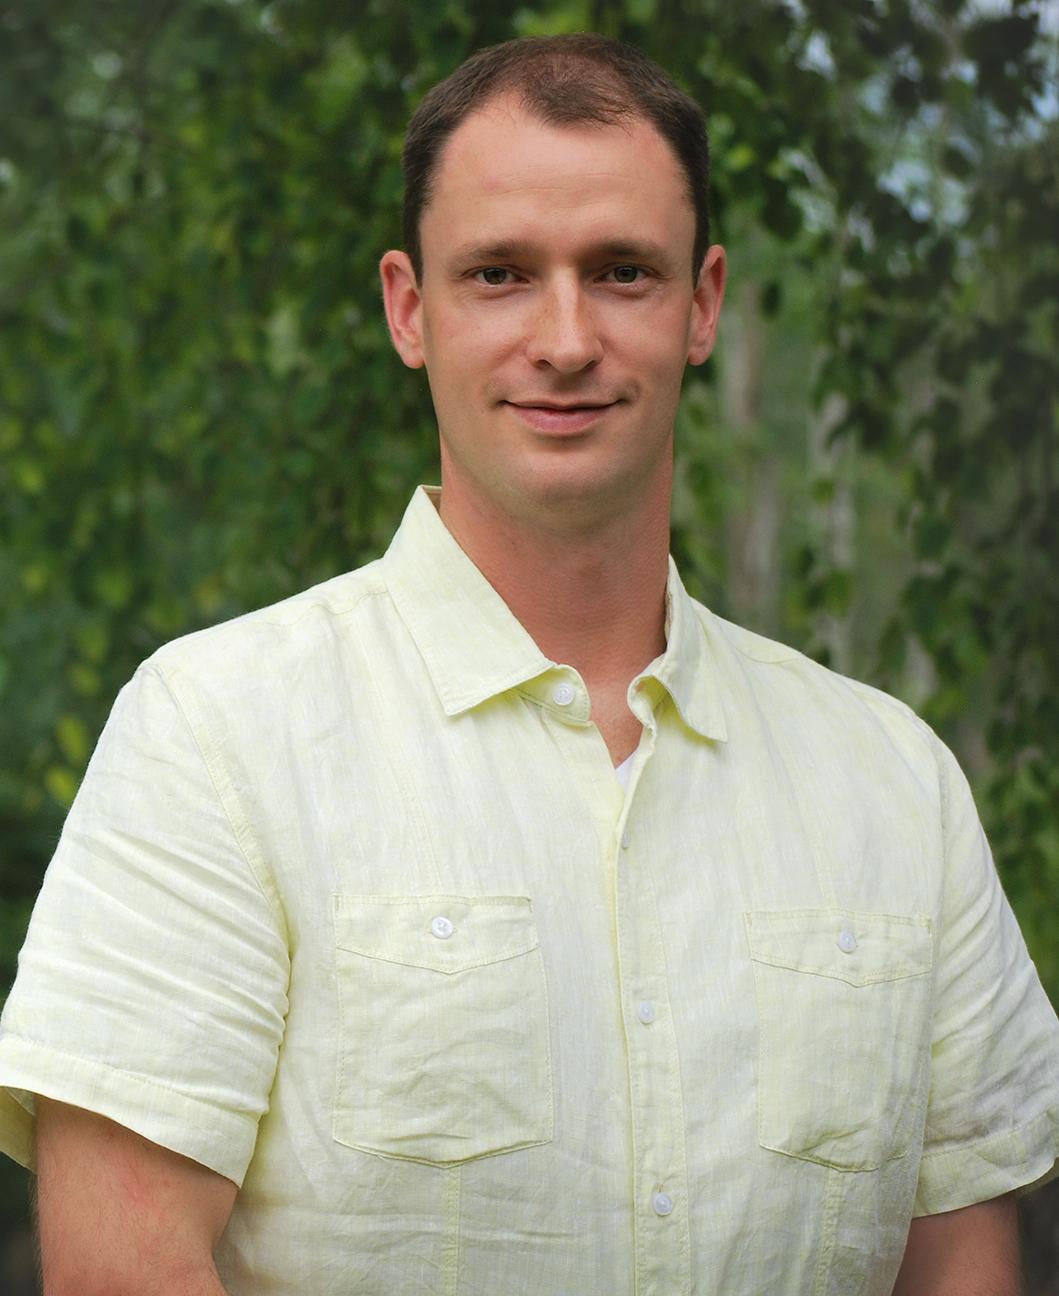 Andrew Friesen